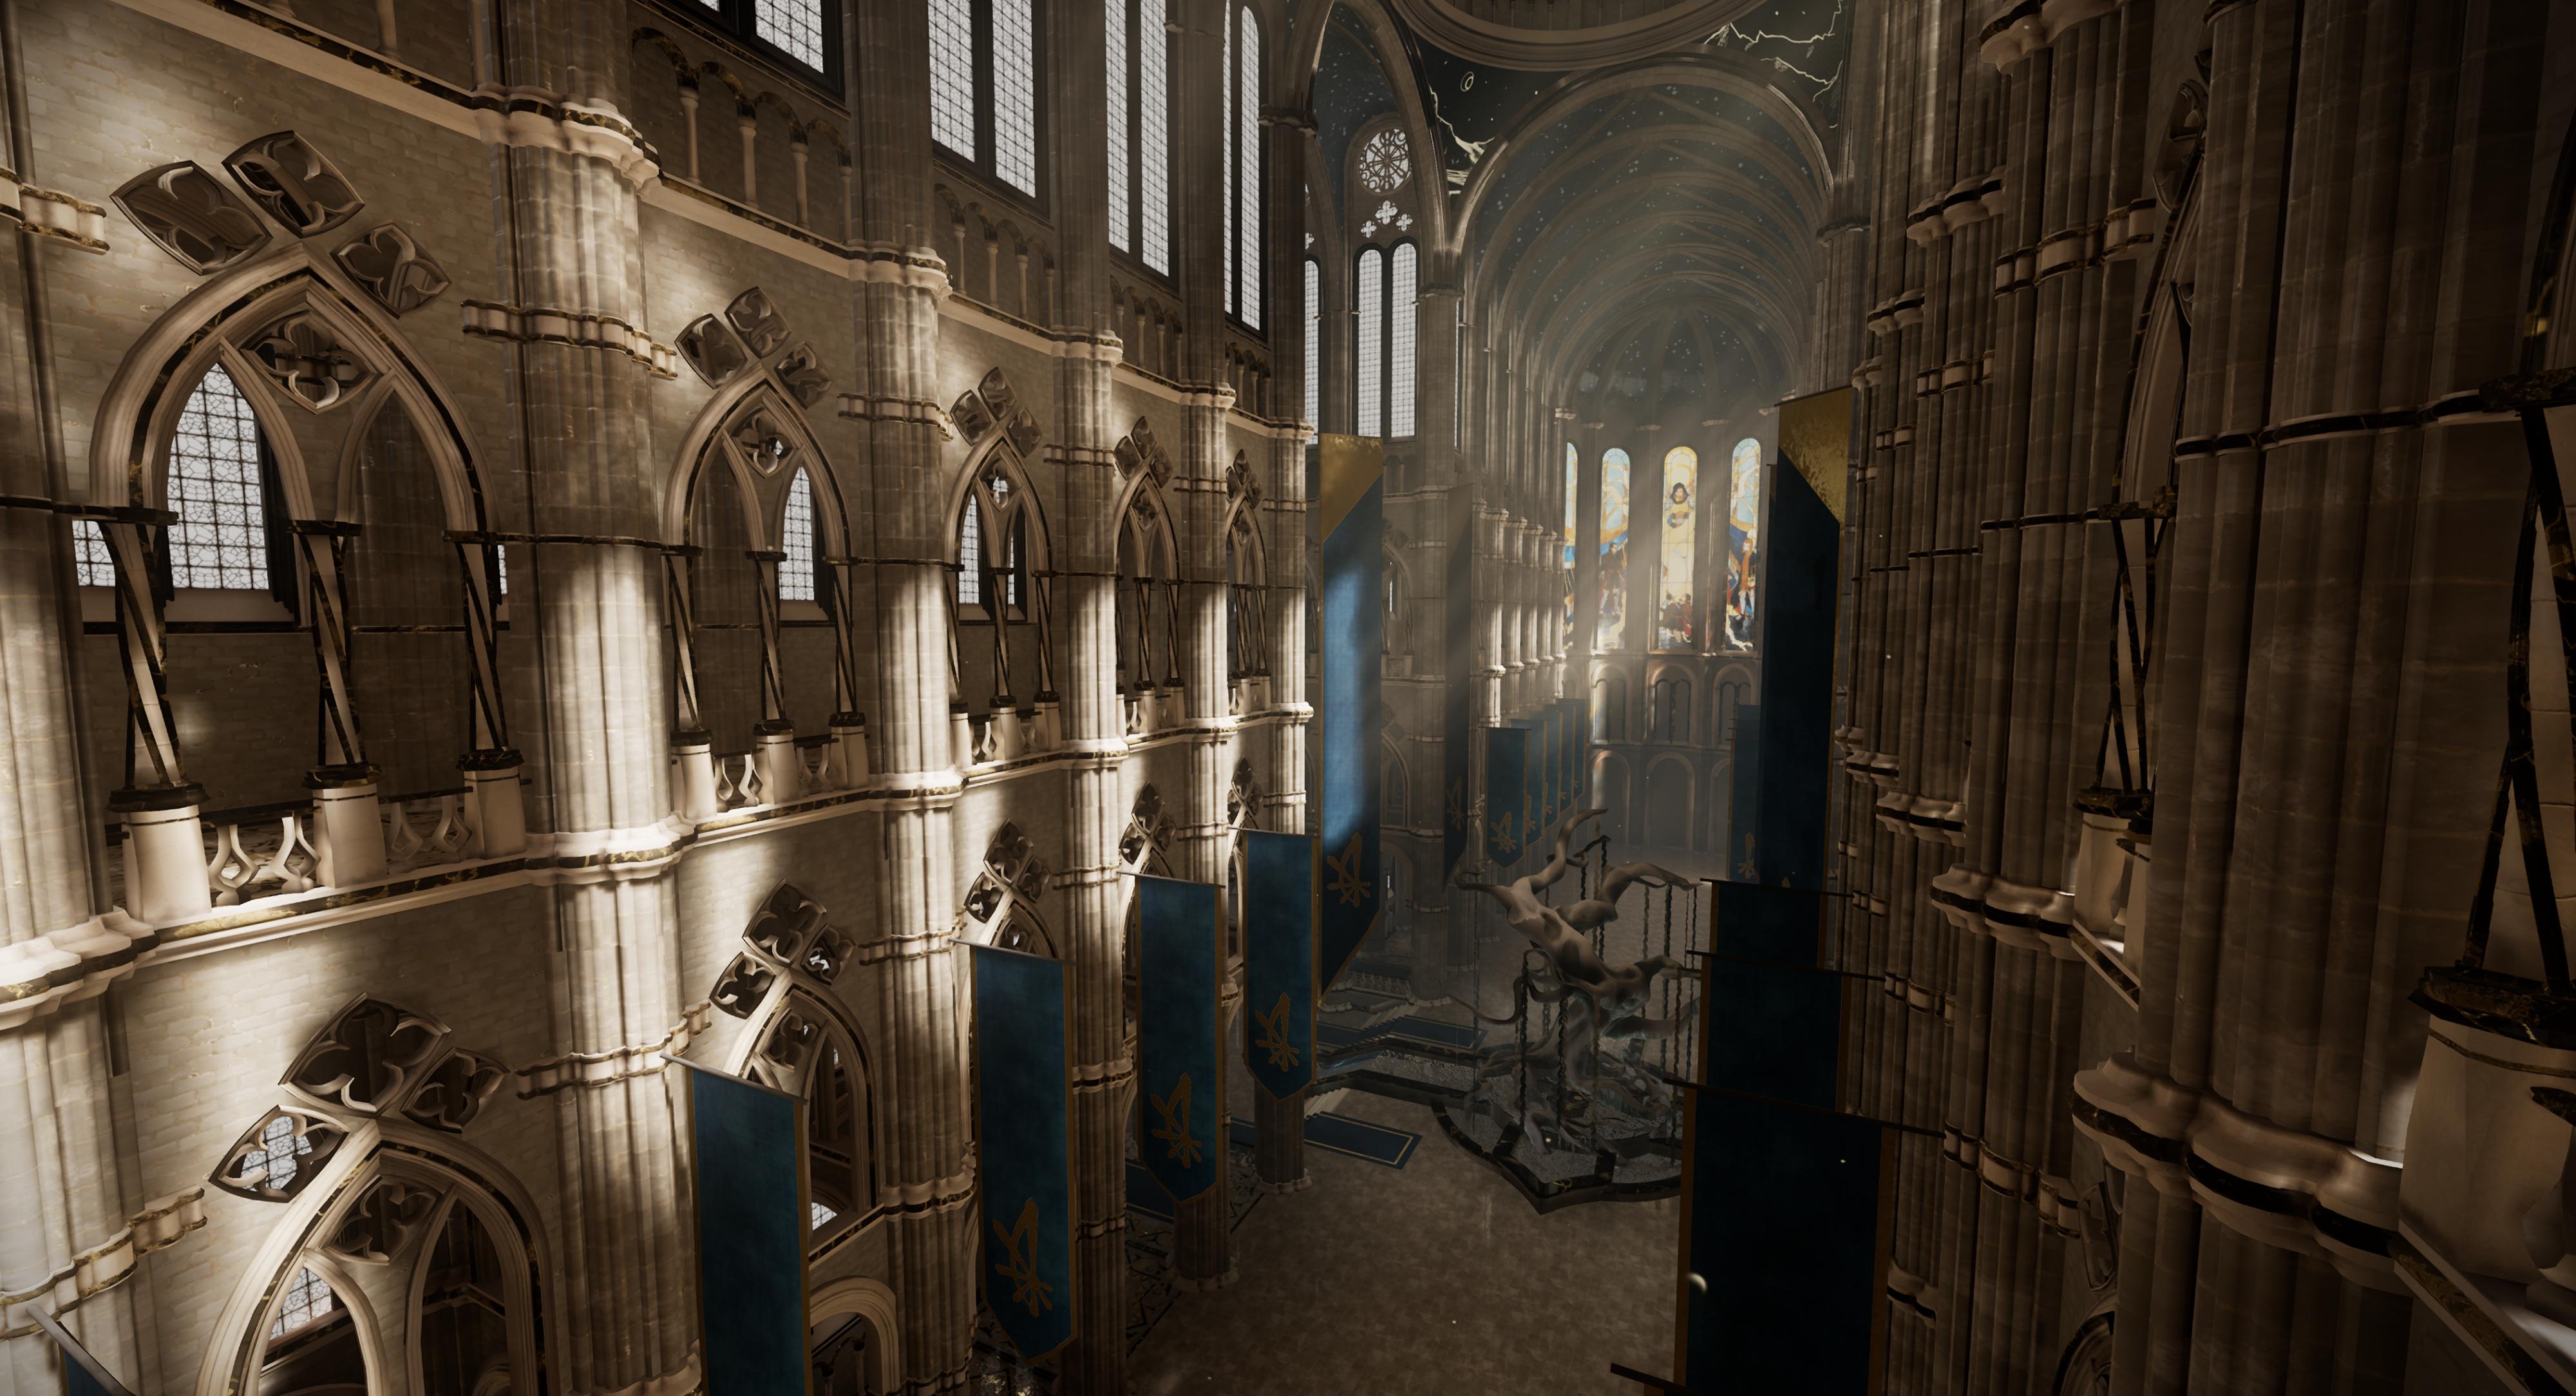 The Citadel - Transept